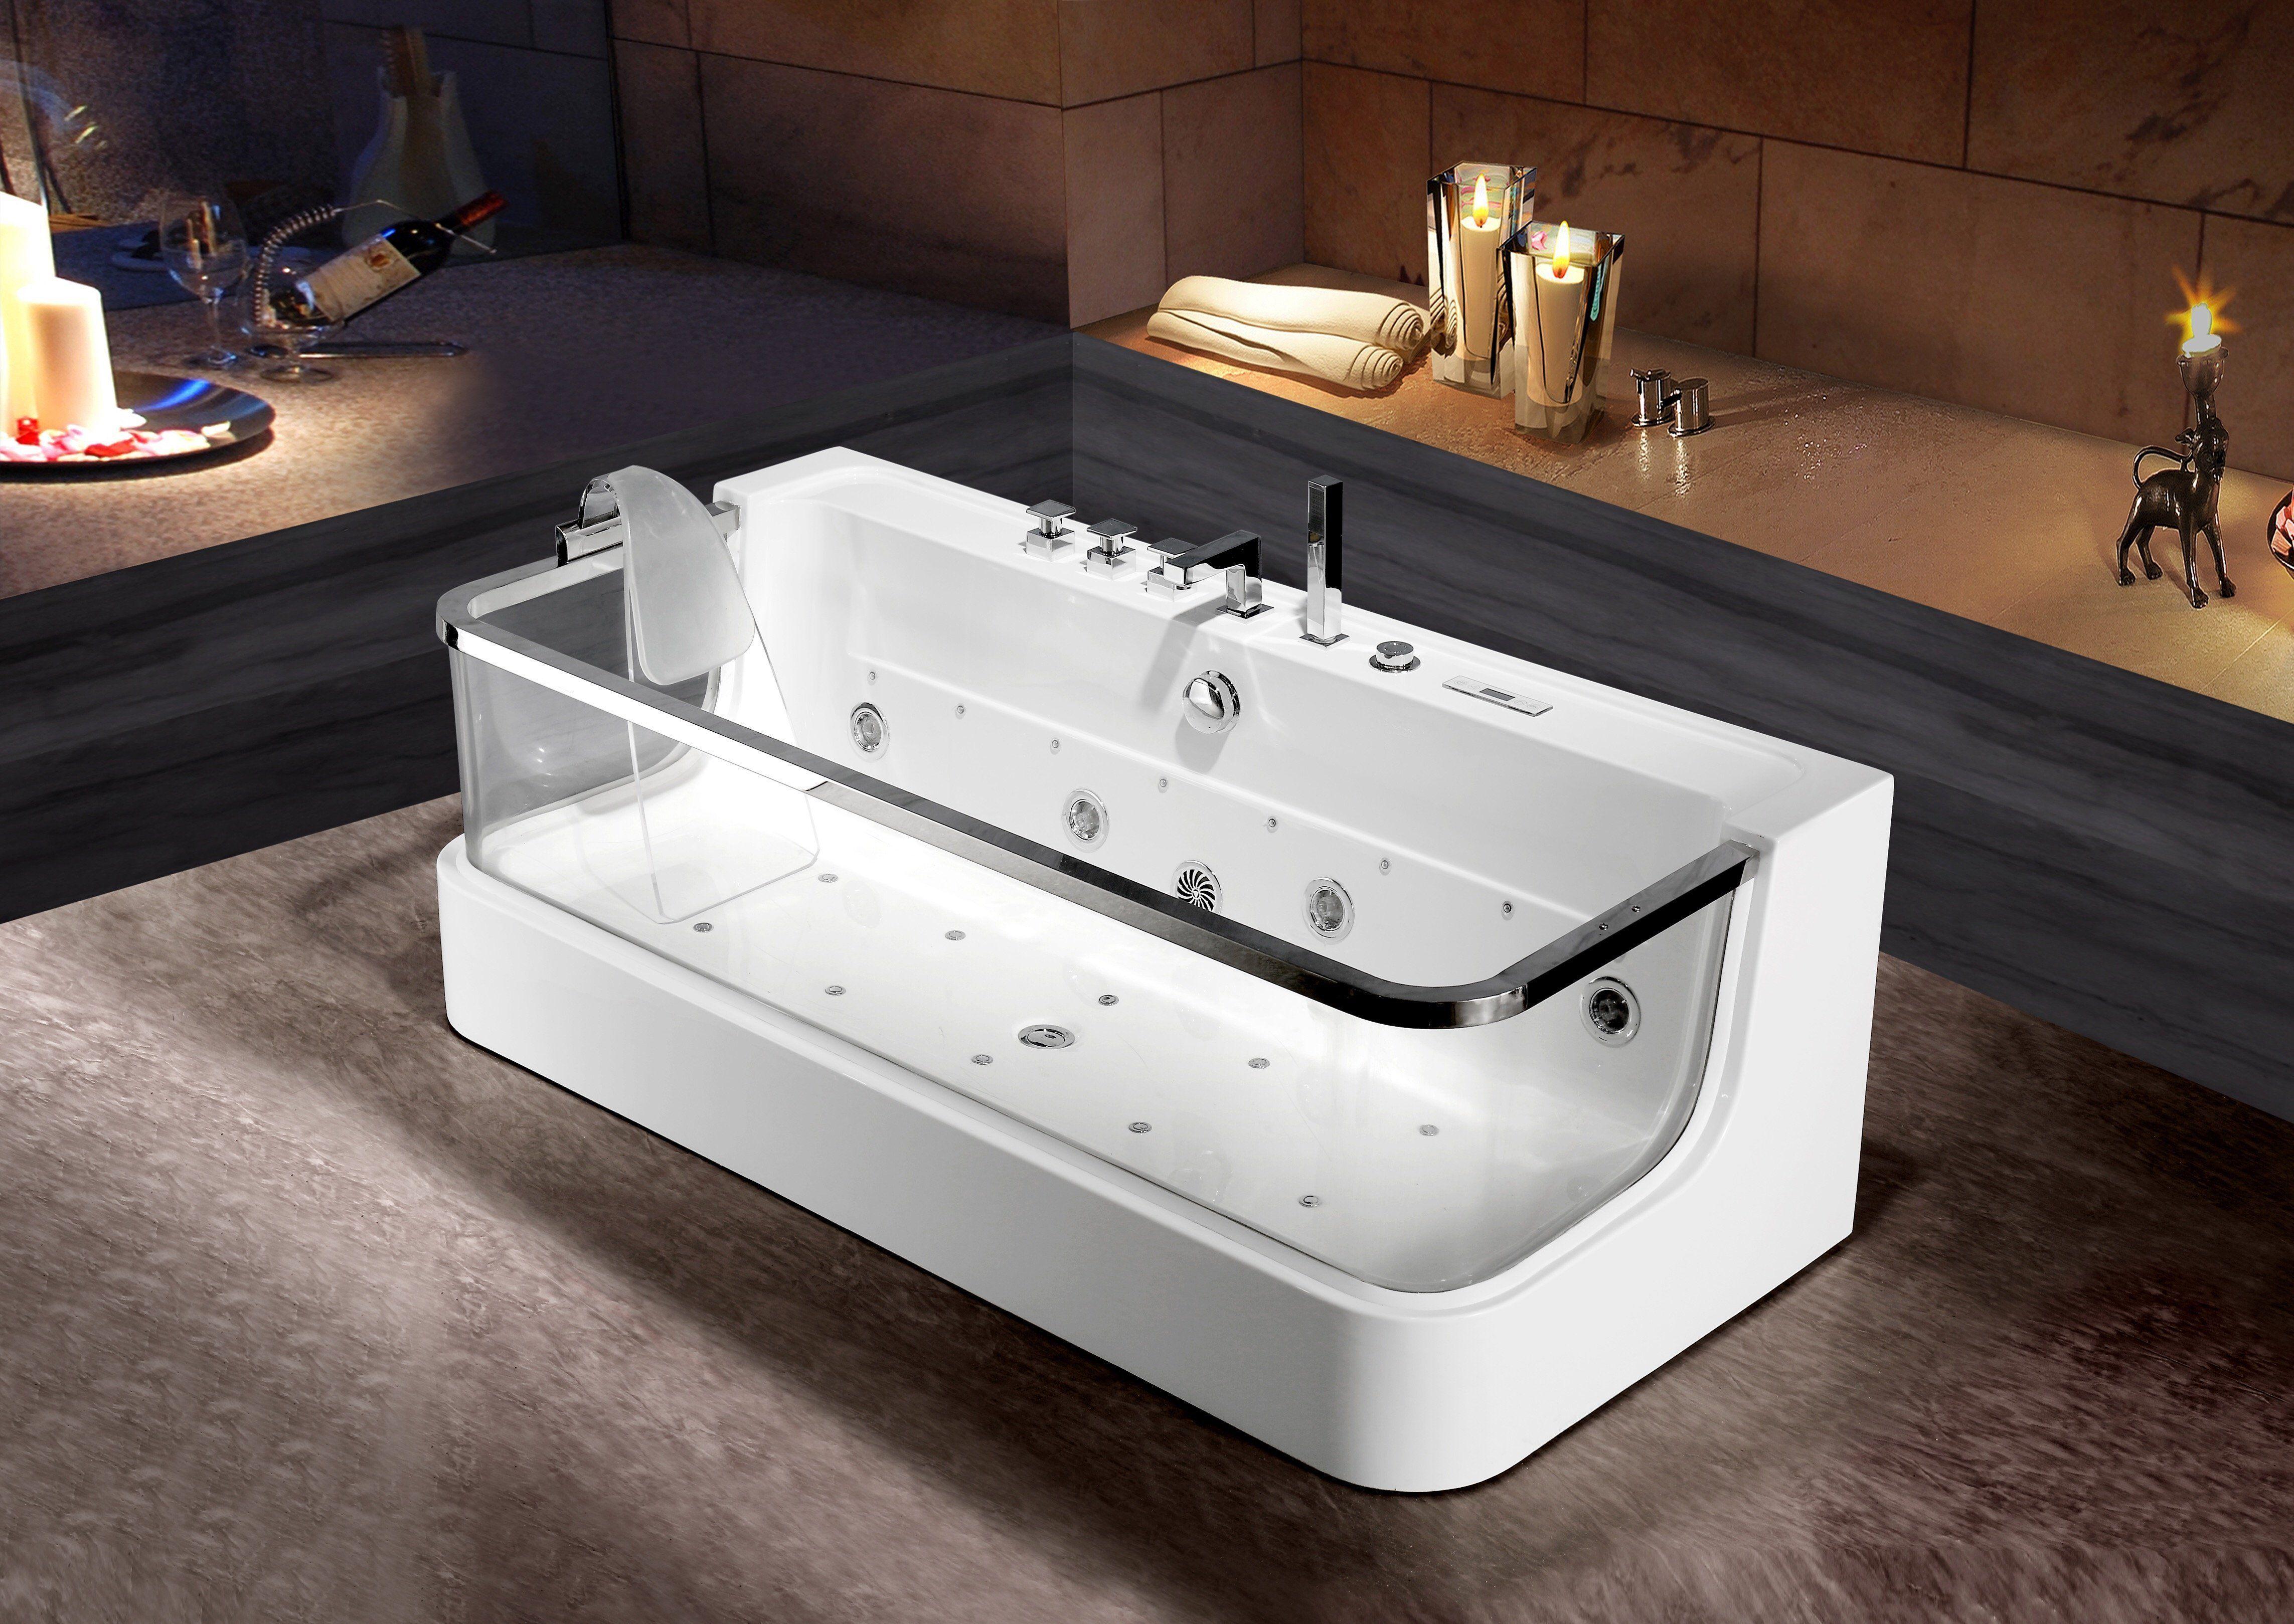 Rubeza C-451 Whirlpool Luxury Massage Jets Bathtub – RUBEZA ...